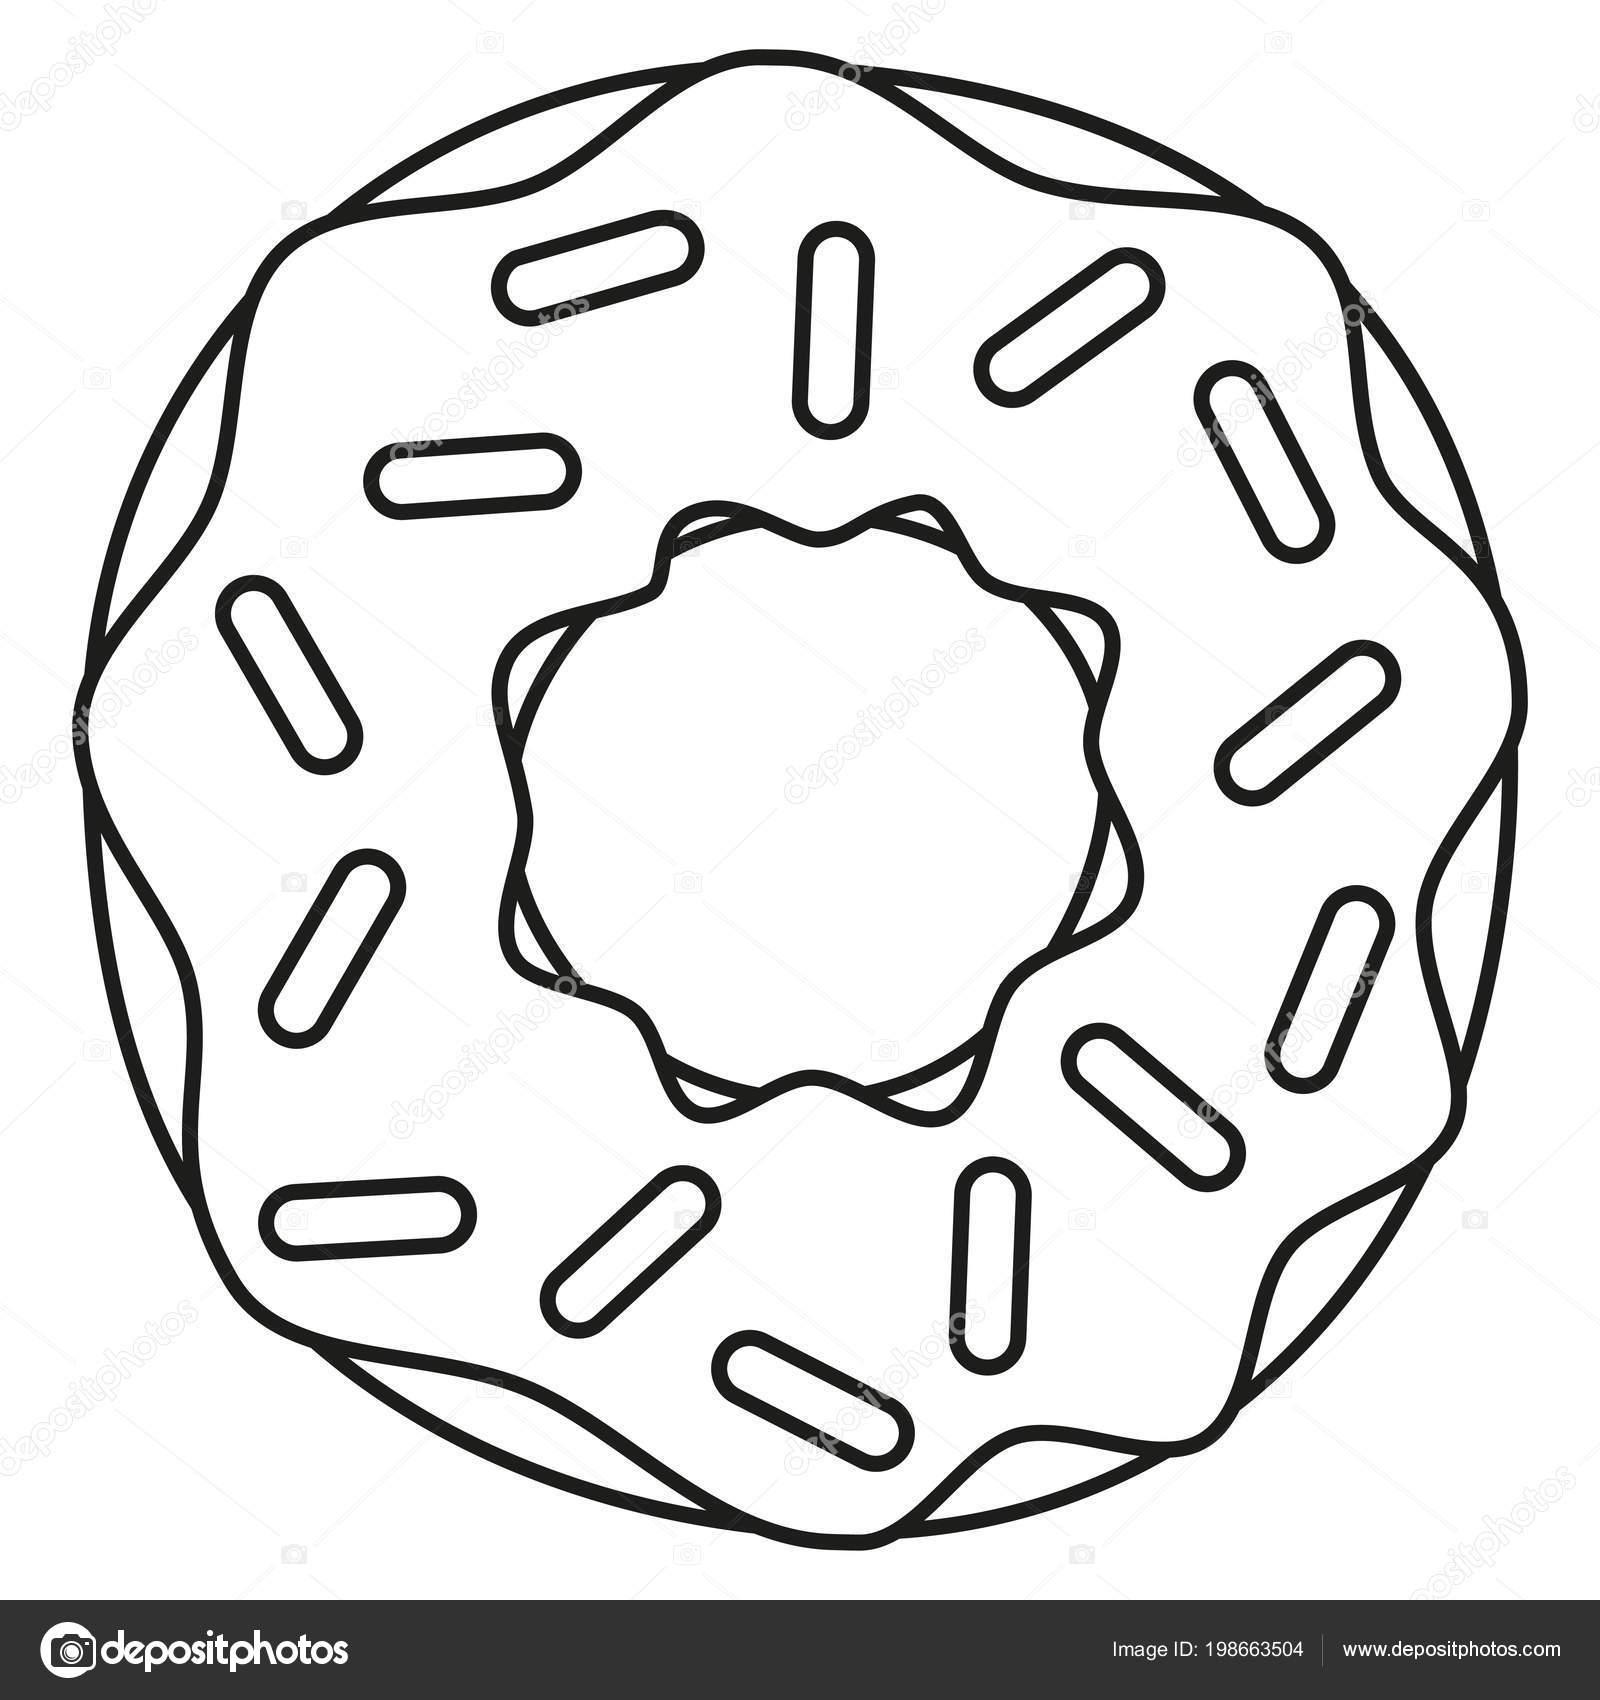 malvorlagen donut | Coloring and Malvorlagan